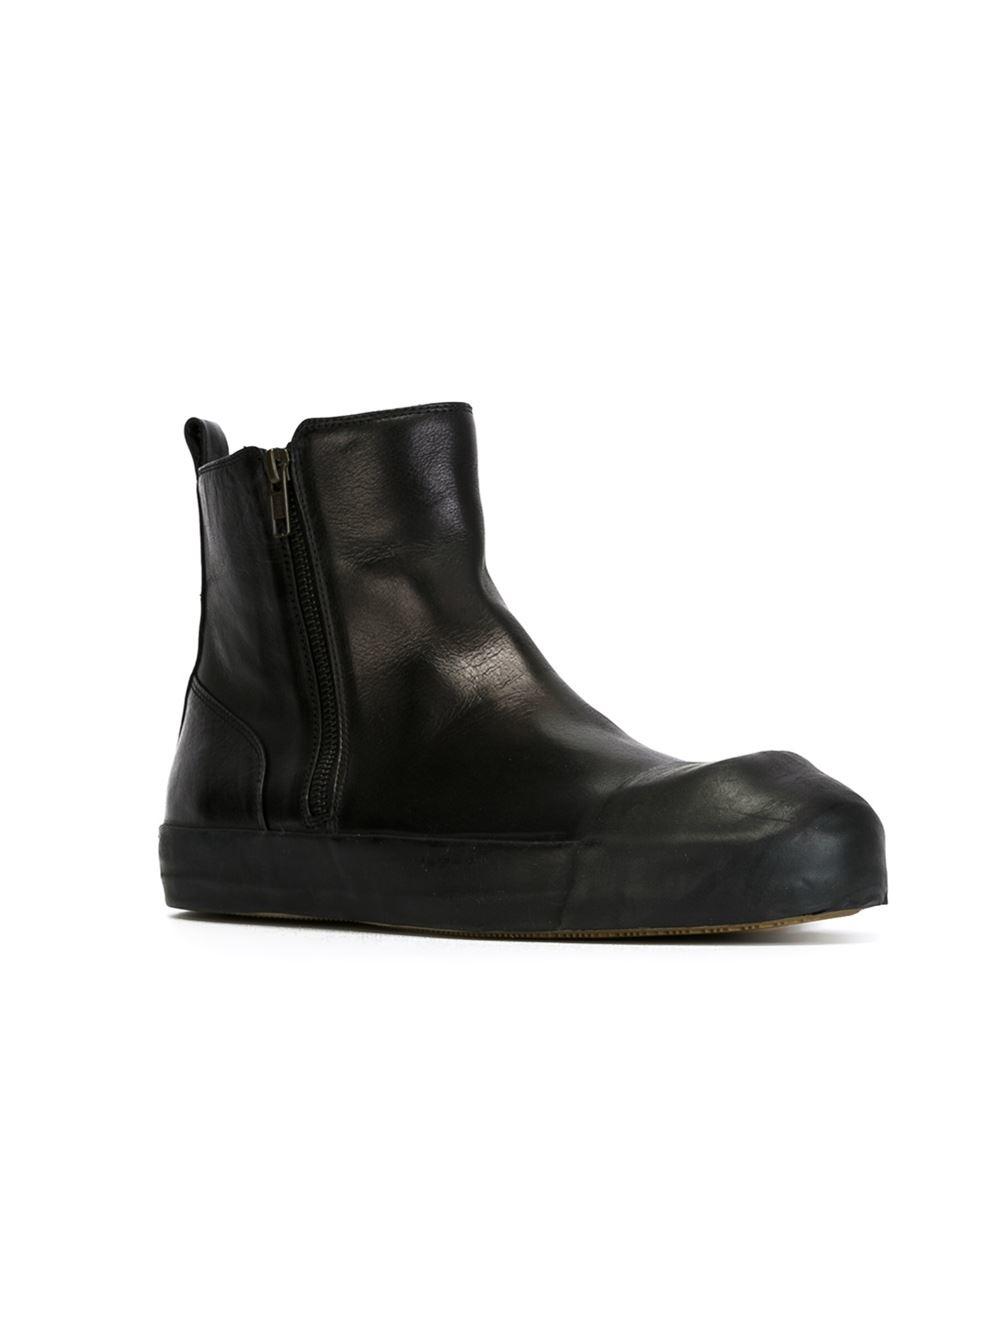 ANN DEMEULEMEESTERLeather Side Zip Boots nEd6jKnx1